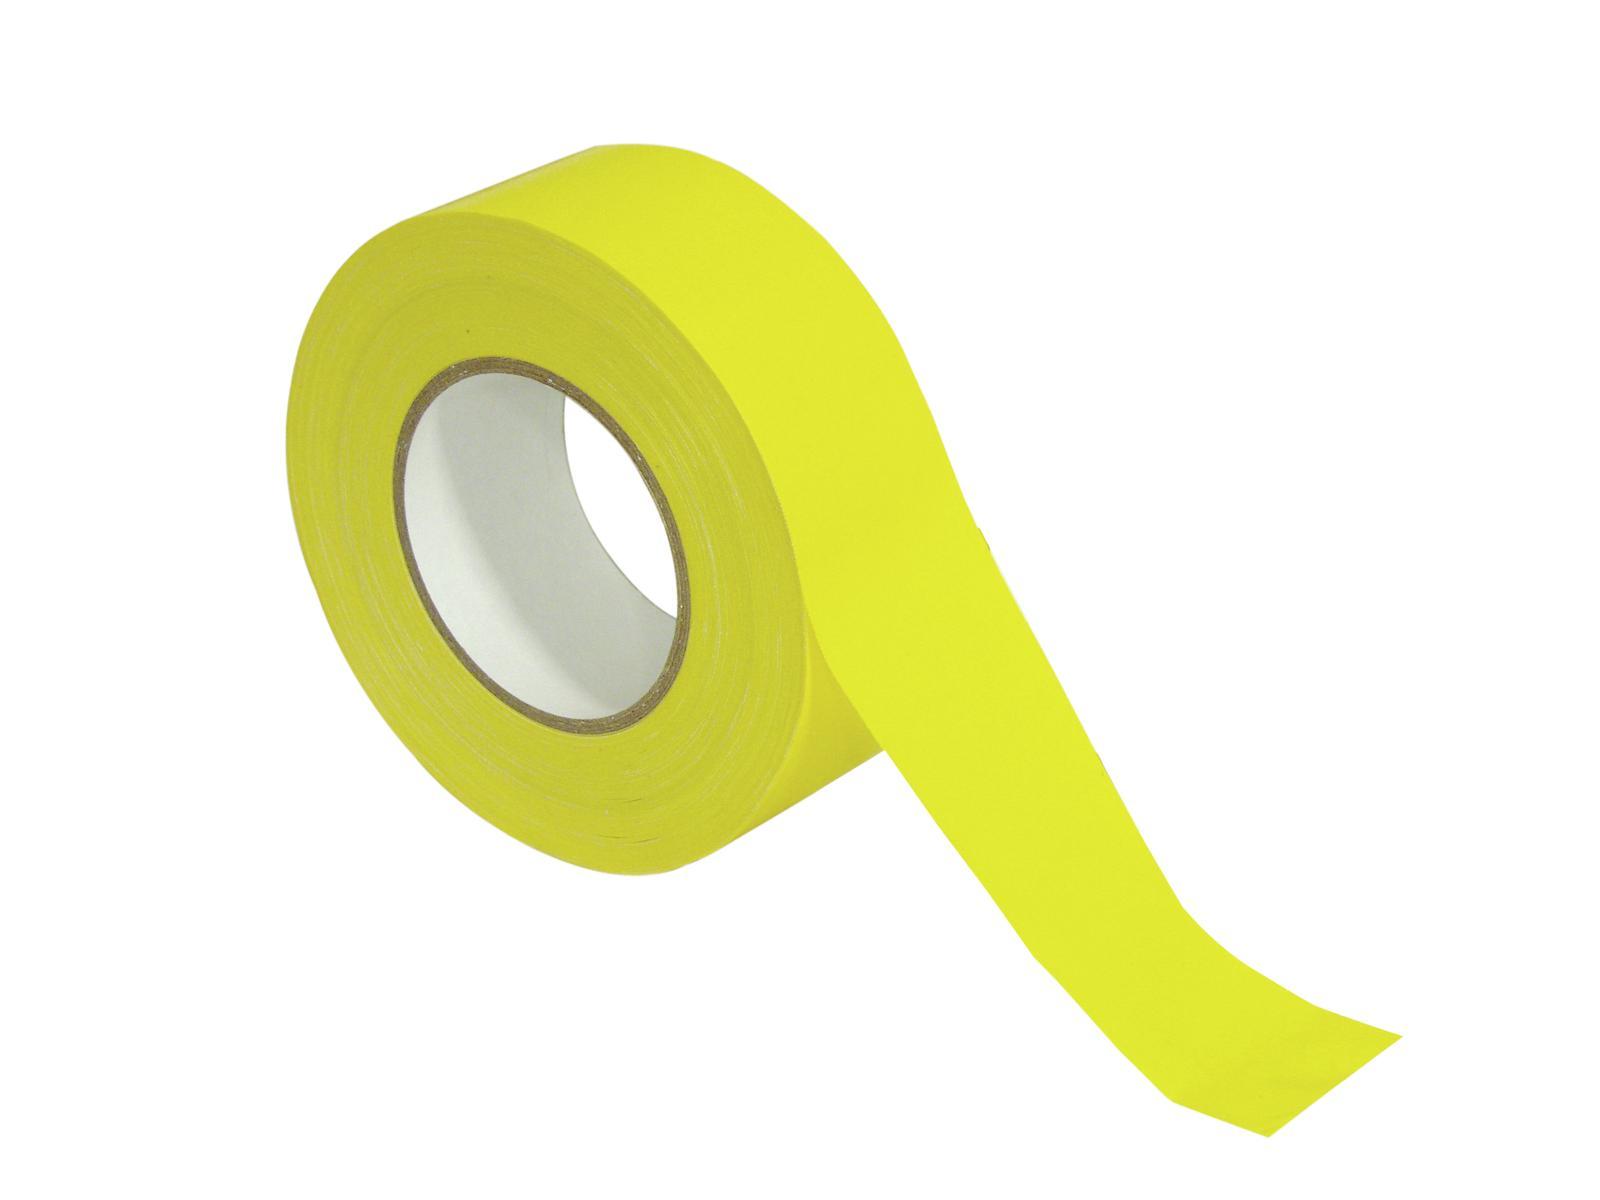 ACCESSORY Gaffa Tape Pro 50mm x 50m gelb